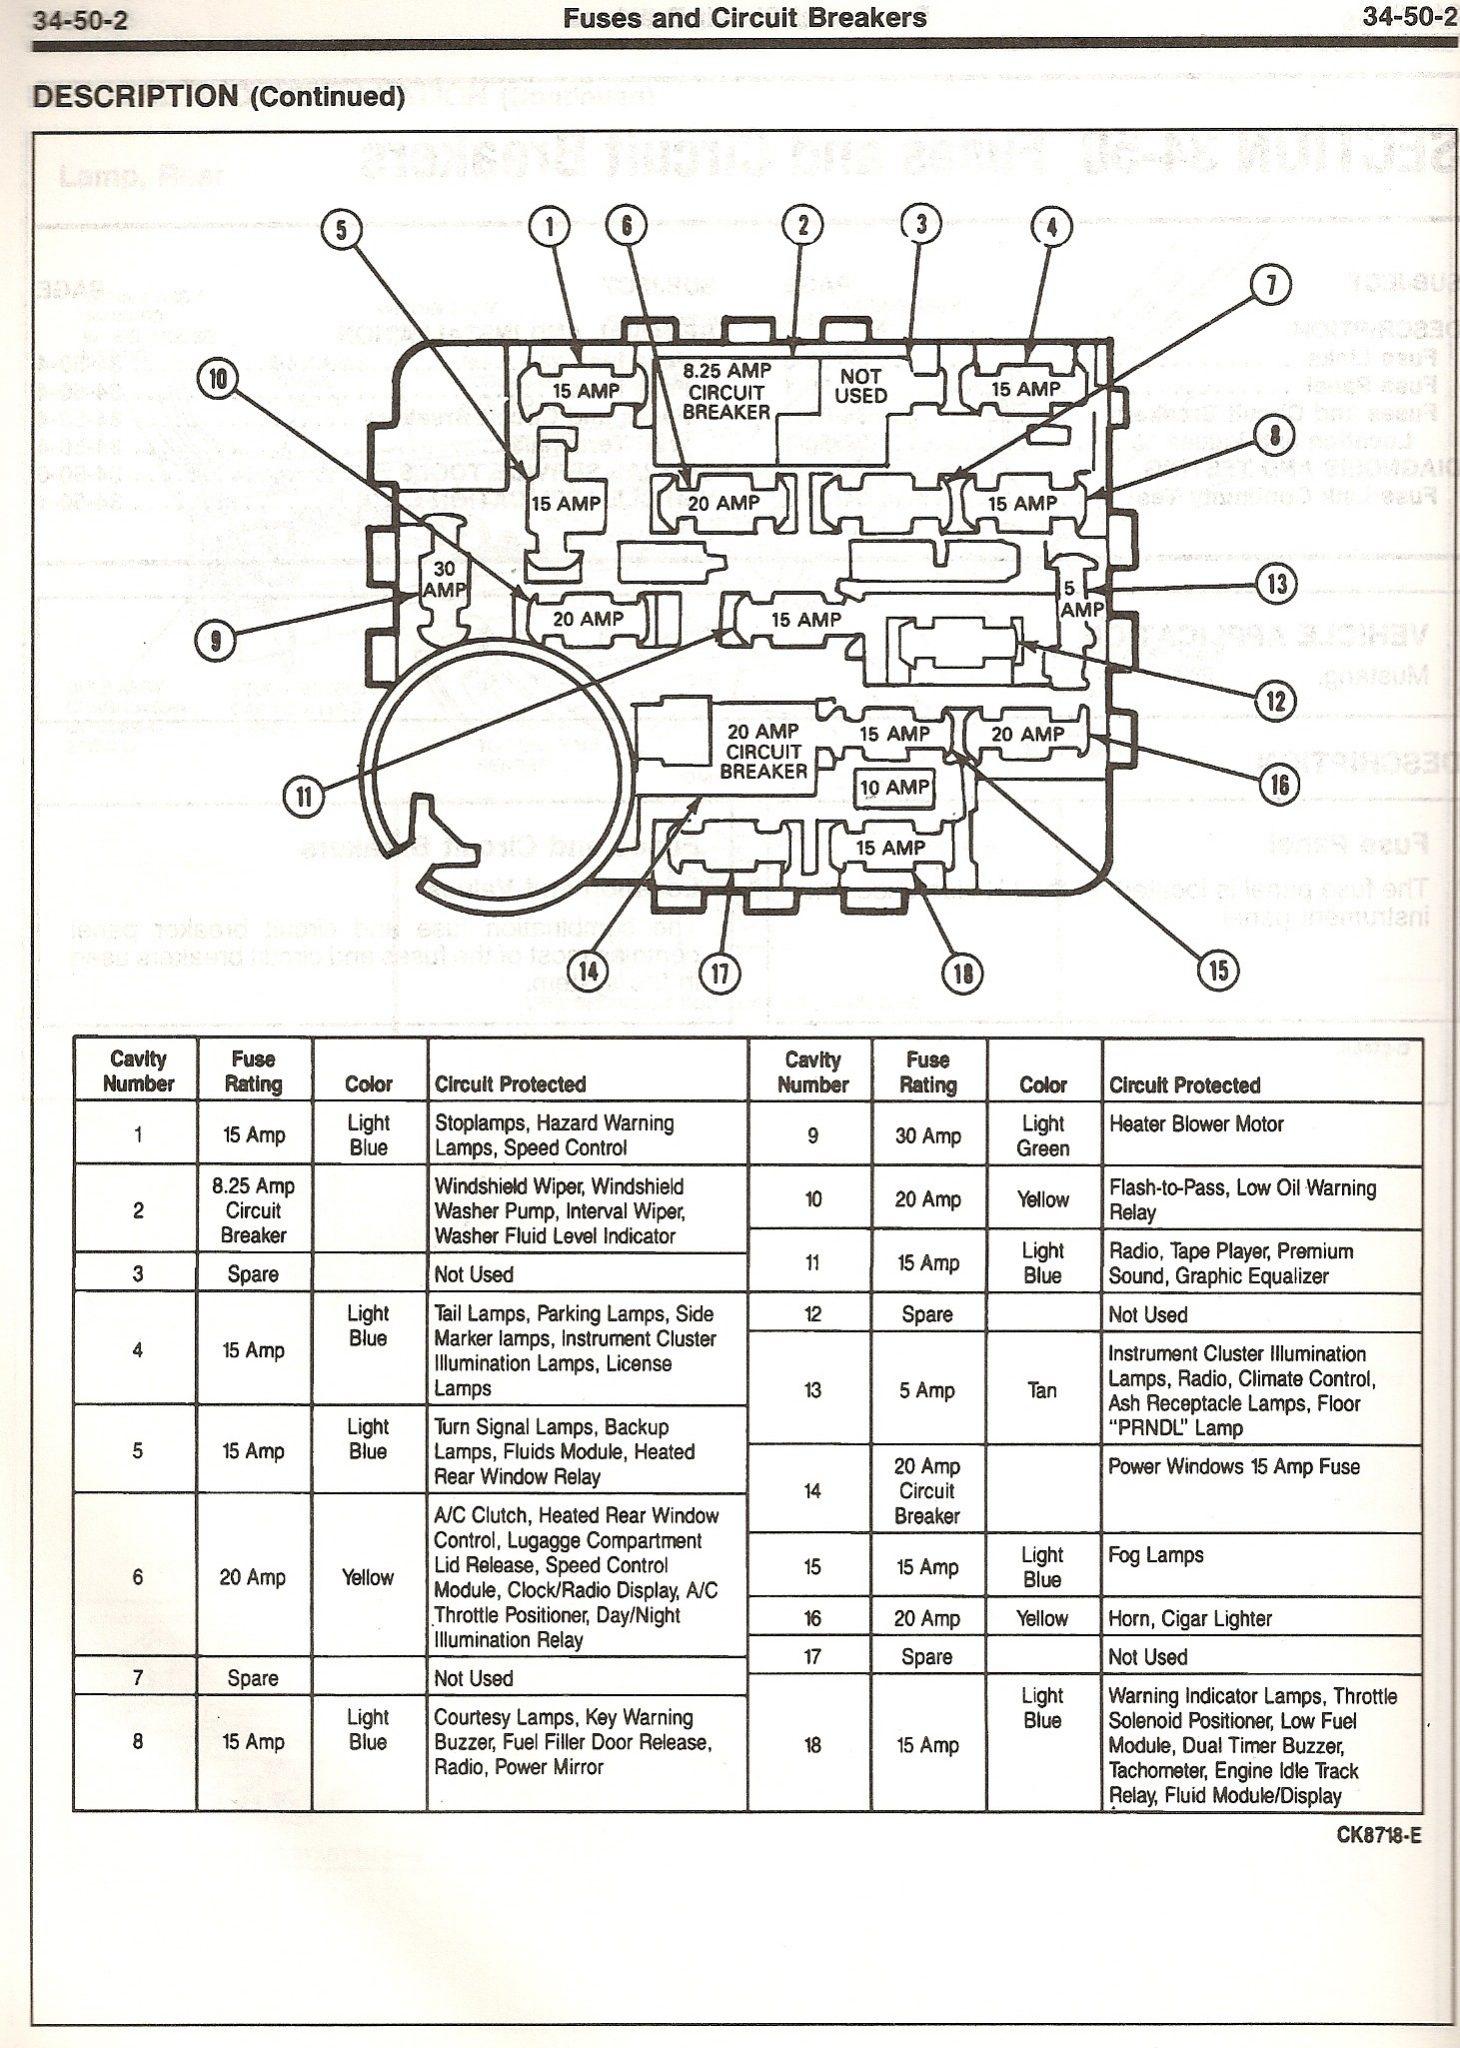 1991 Ford Explorer Fuse Box Diagram Wiring Diagrams Name Name Miglioribanche It